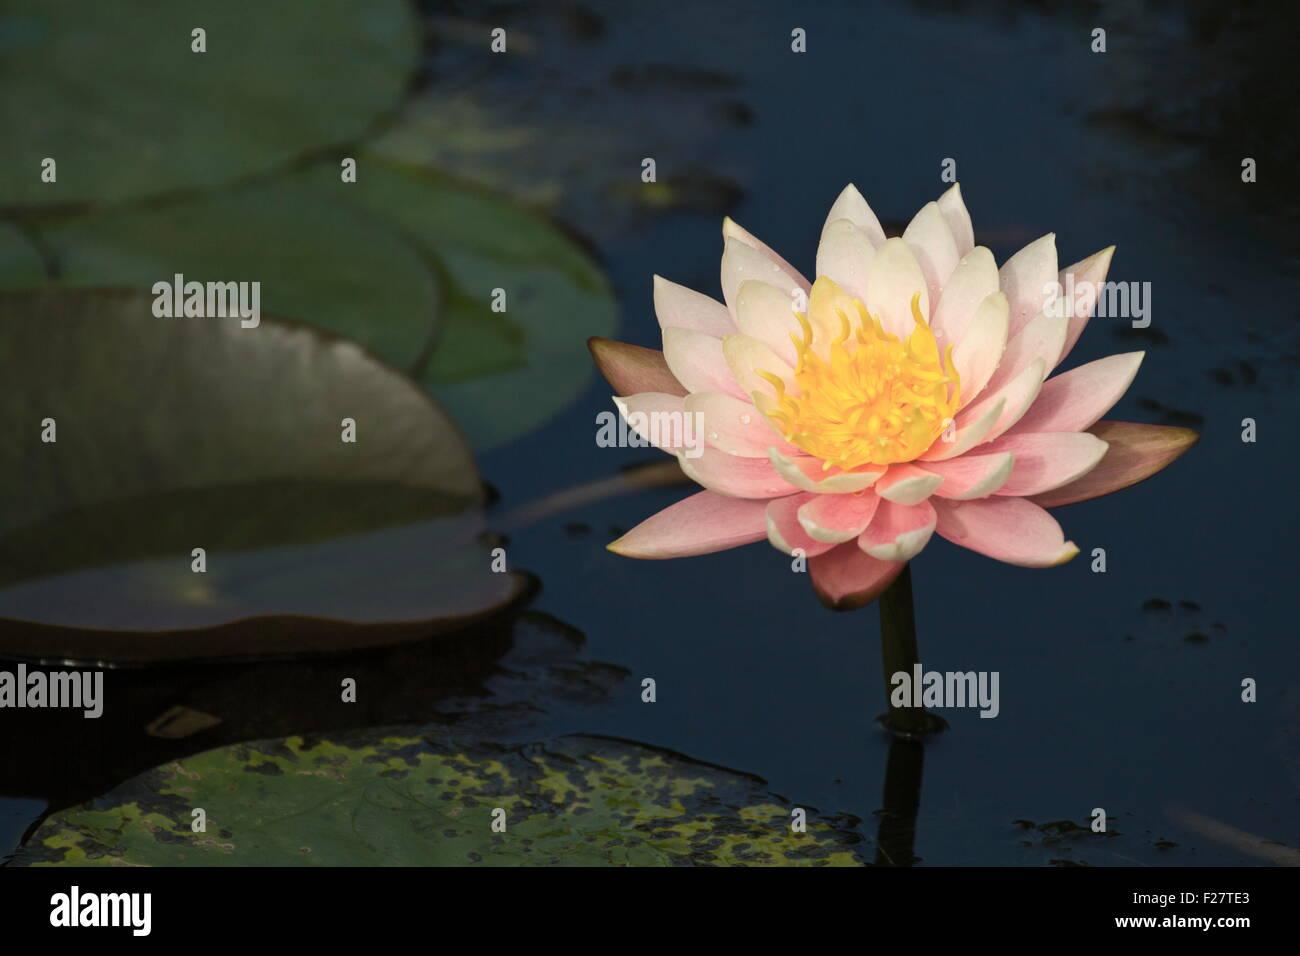 Bloom white lotus in natural habitat stock photo 87454027 alamy bloom white lotus in natural habitat mightylinksfo